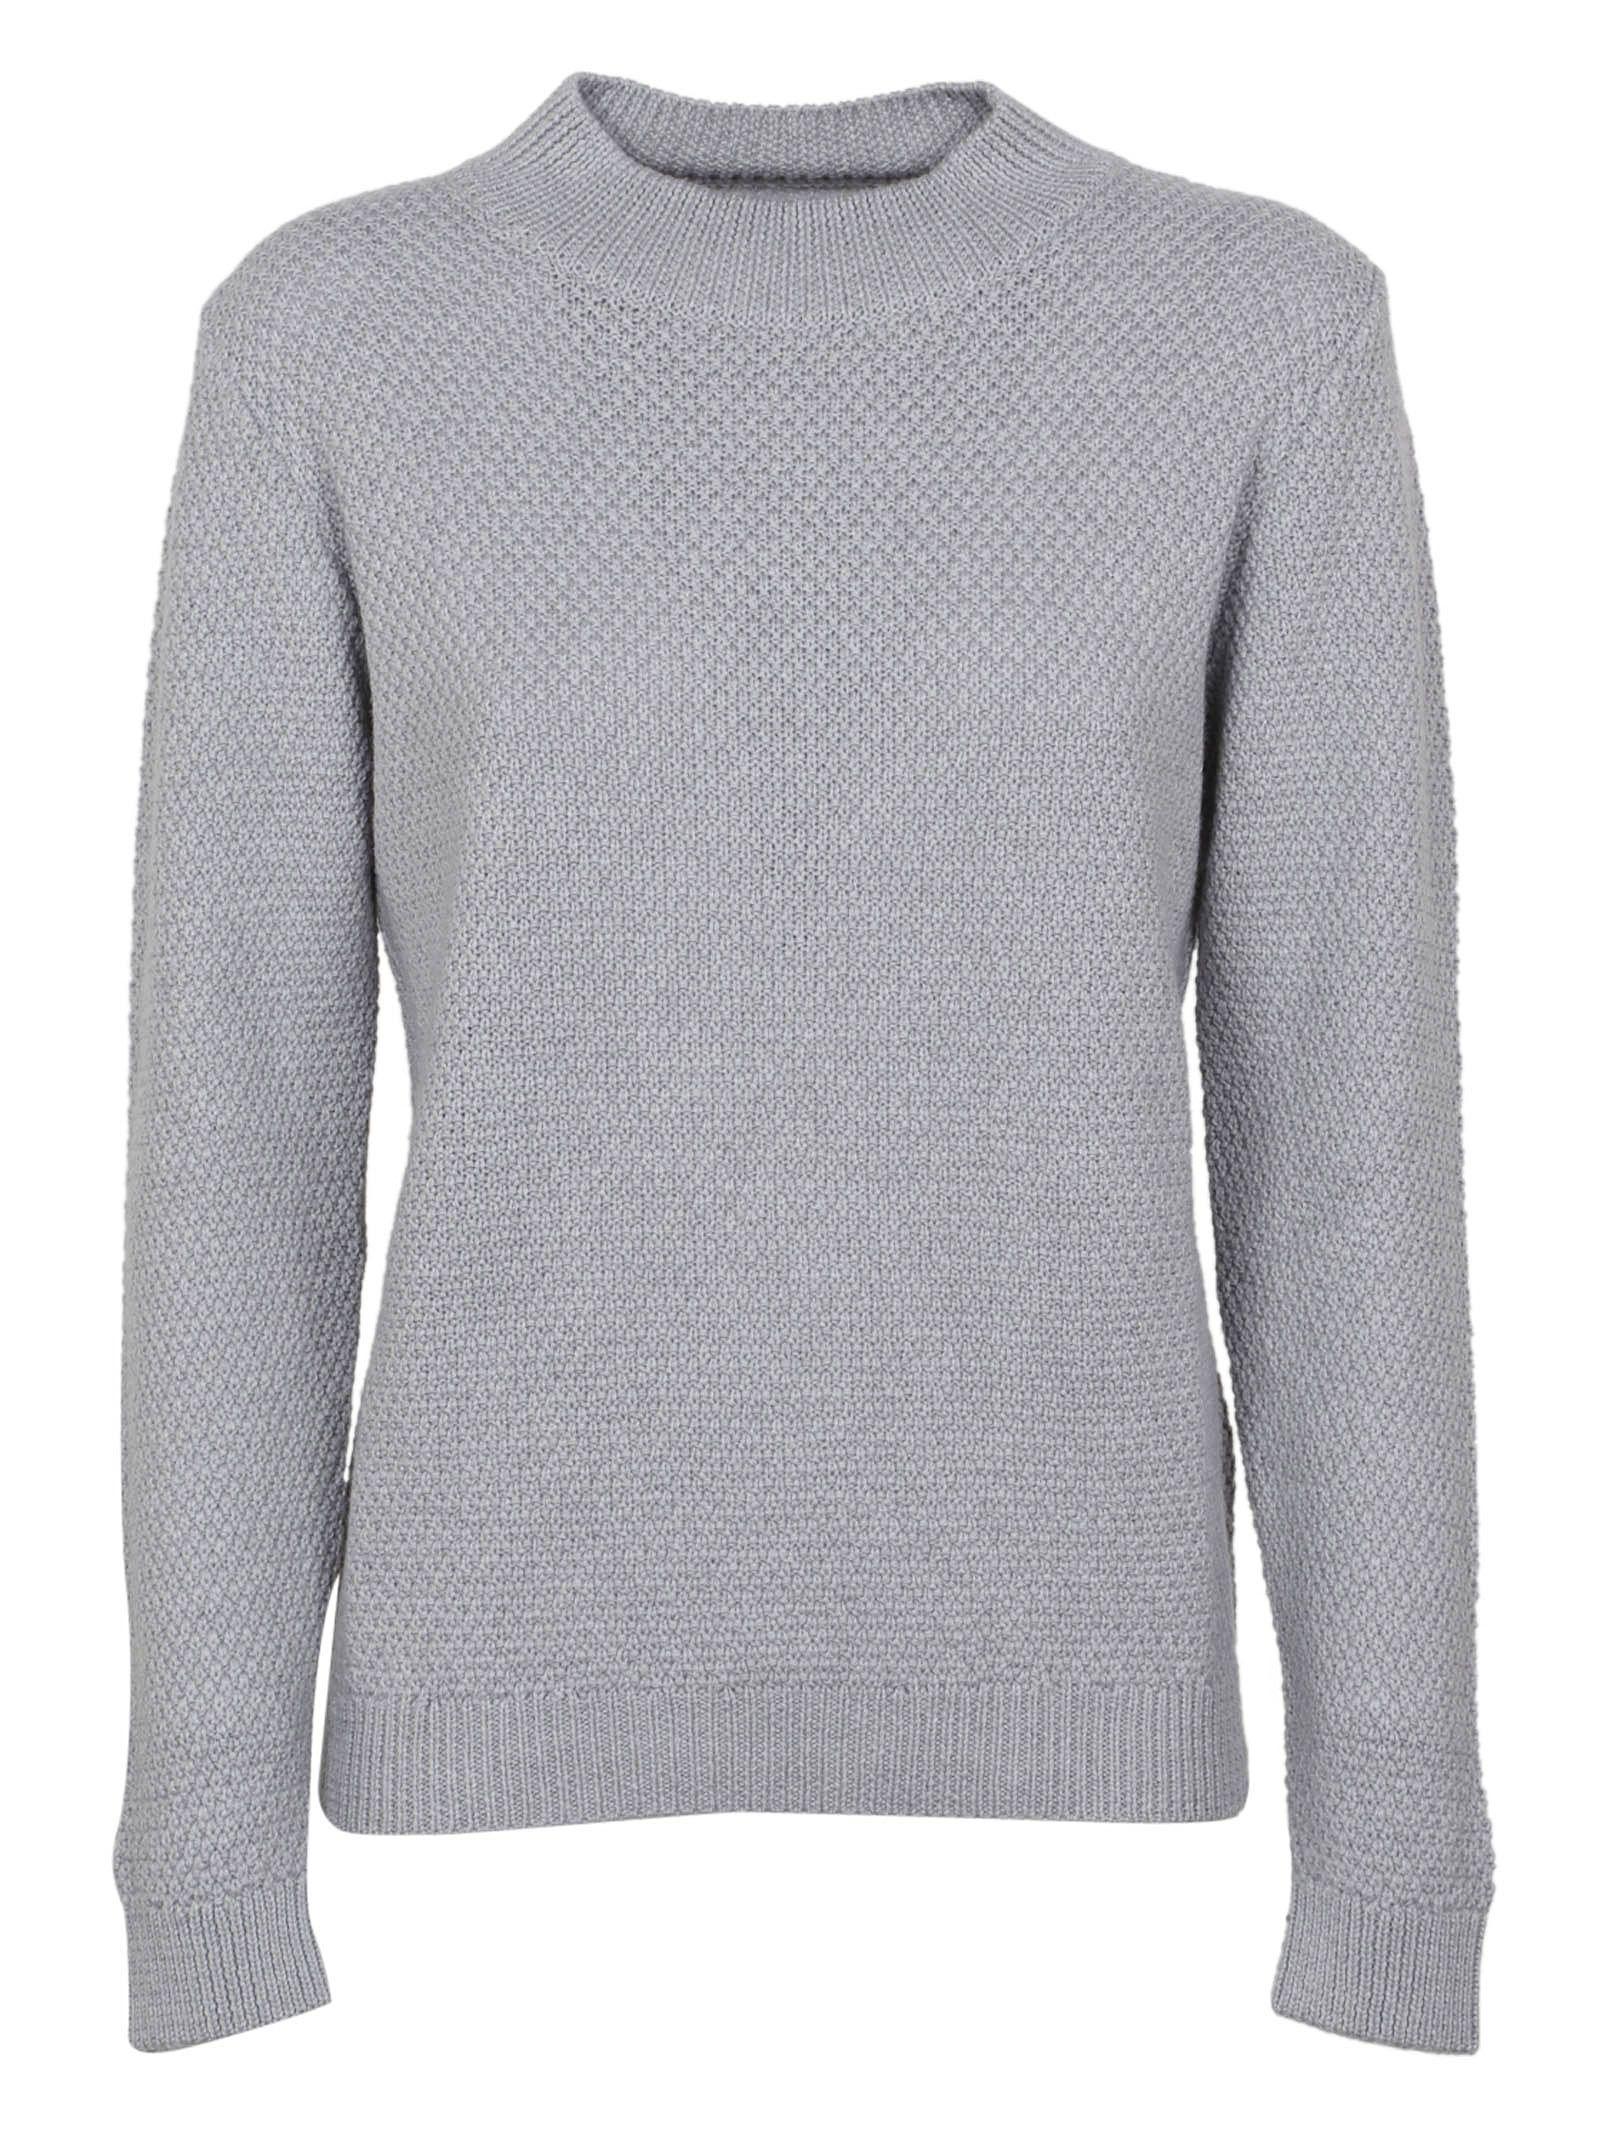 Labo Art Knitted Sweater